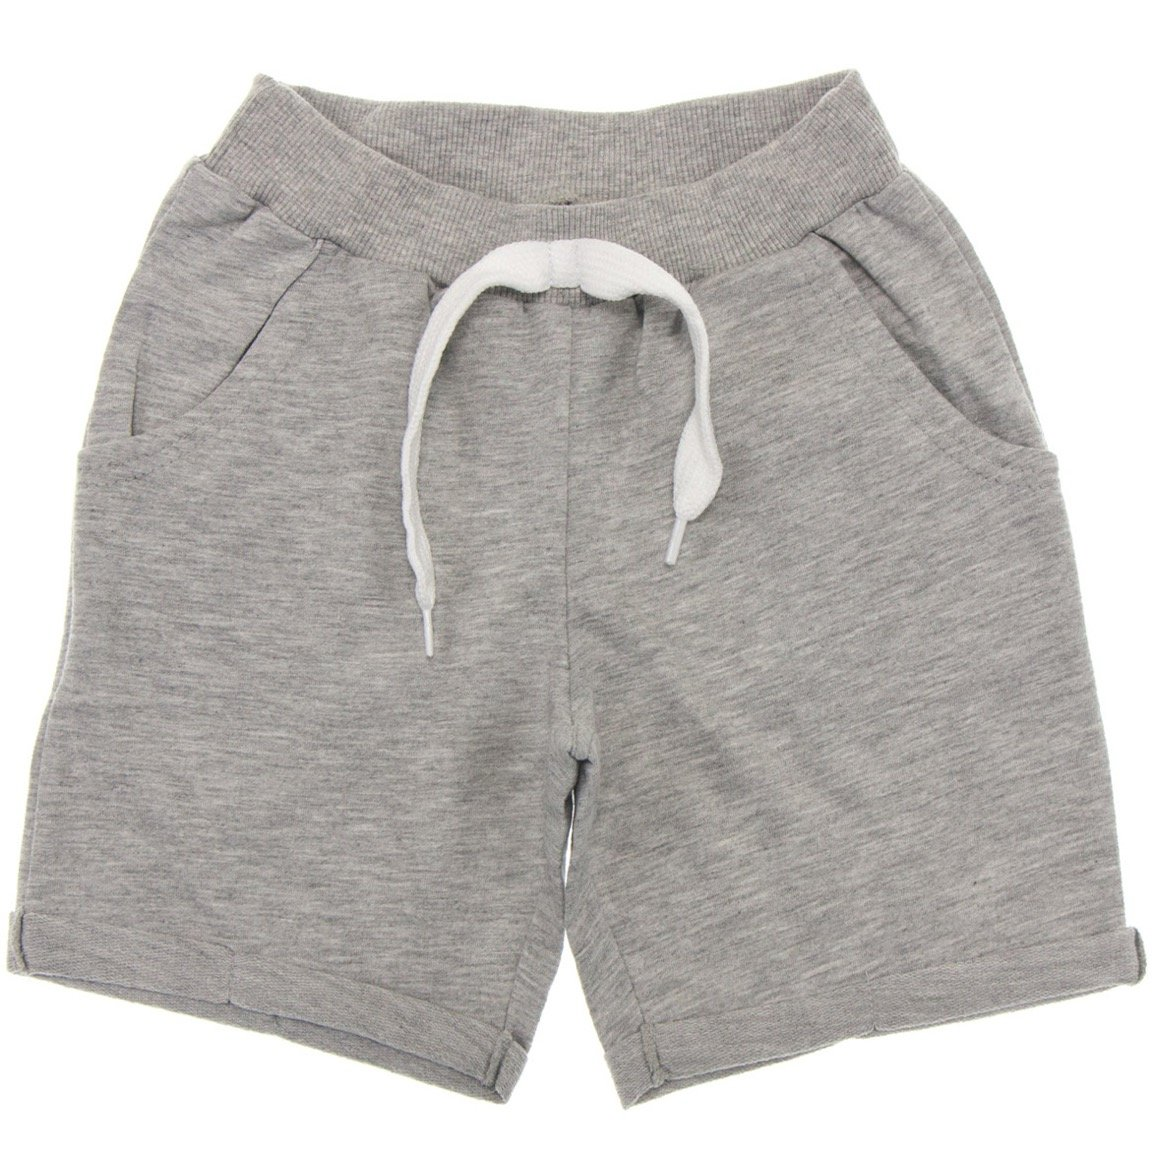 "Joyce παιδικό παντελόνι βερμούδα ""The Grey Practical"""